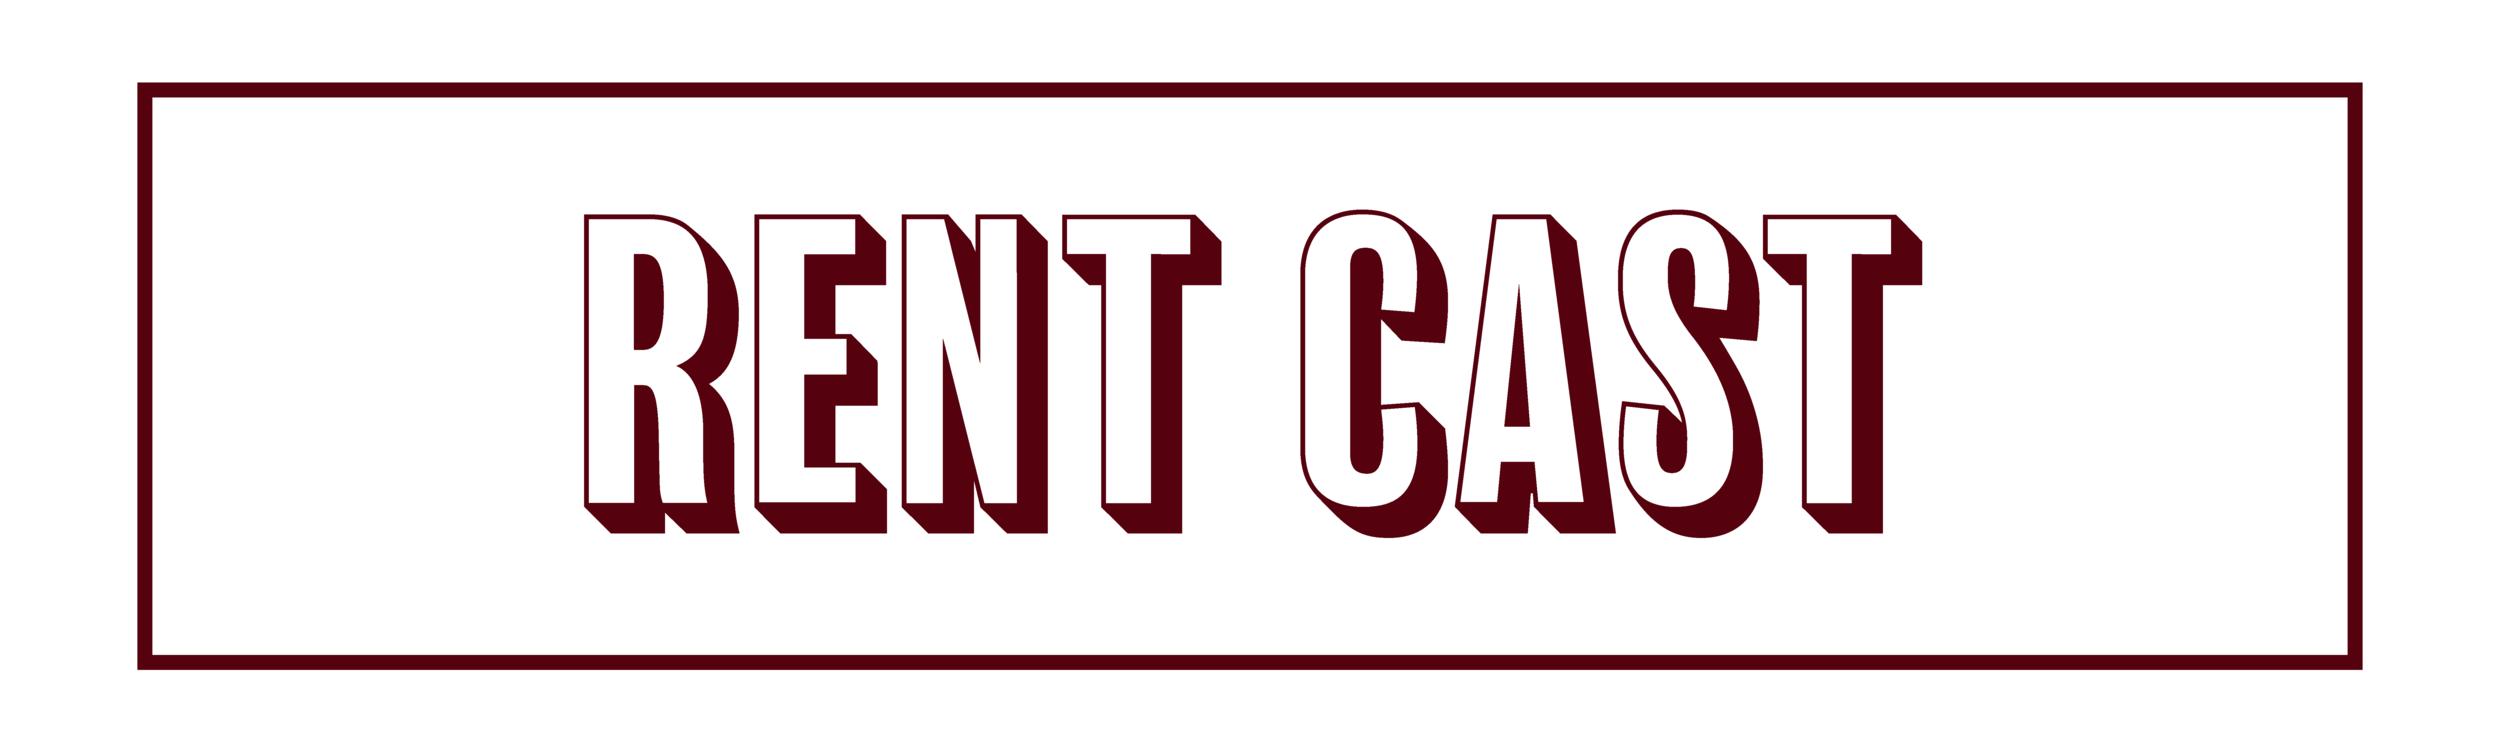 Rent Cast.png